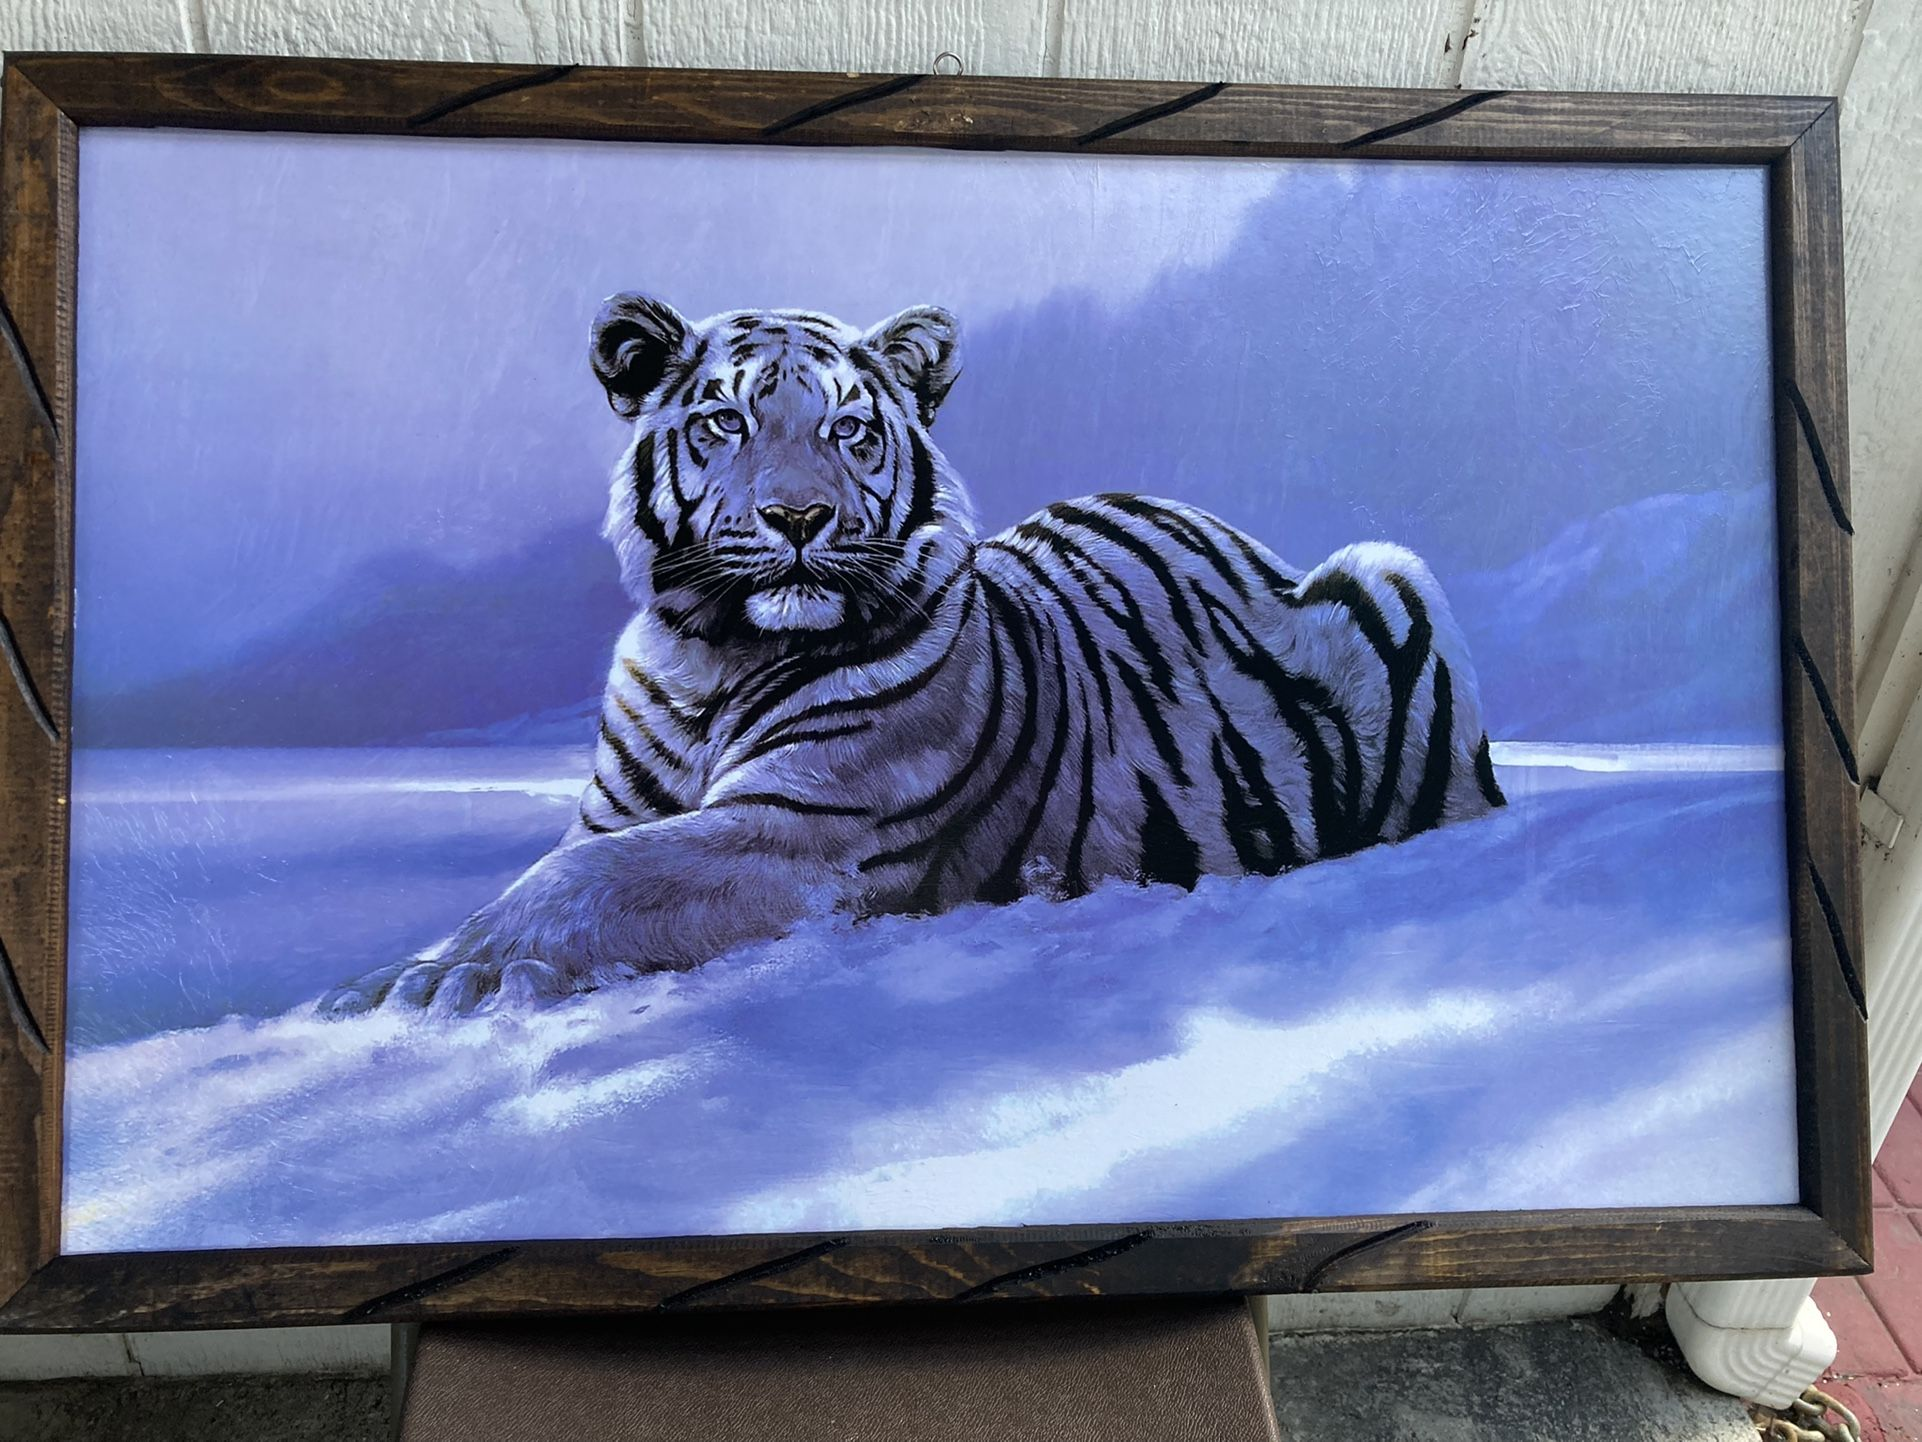 White Tiger 🐅 Frames Tattoos Shop Barbershop 💈 Home Decor Man Cave Posters Patios Living Room Cuadro